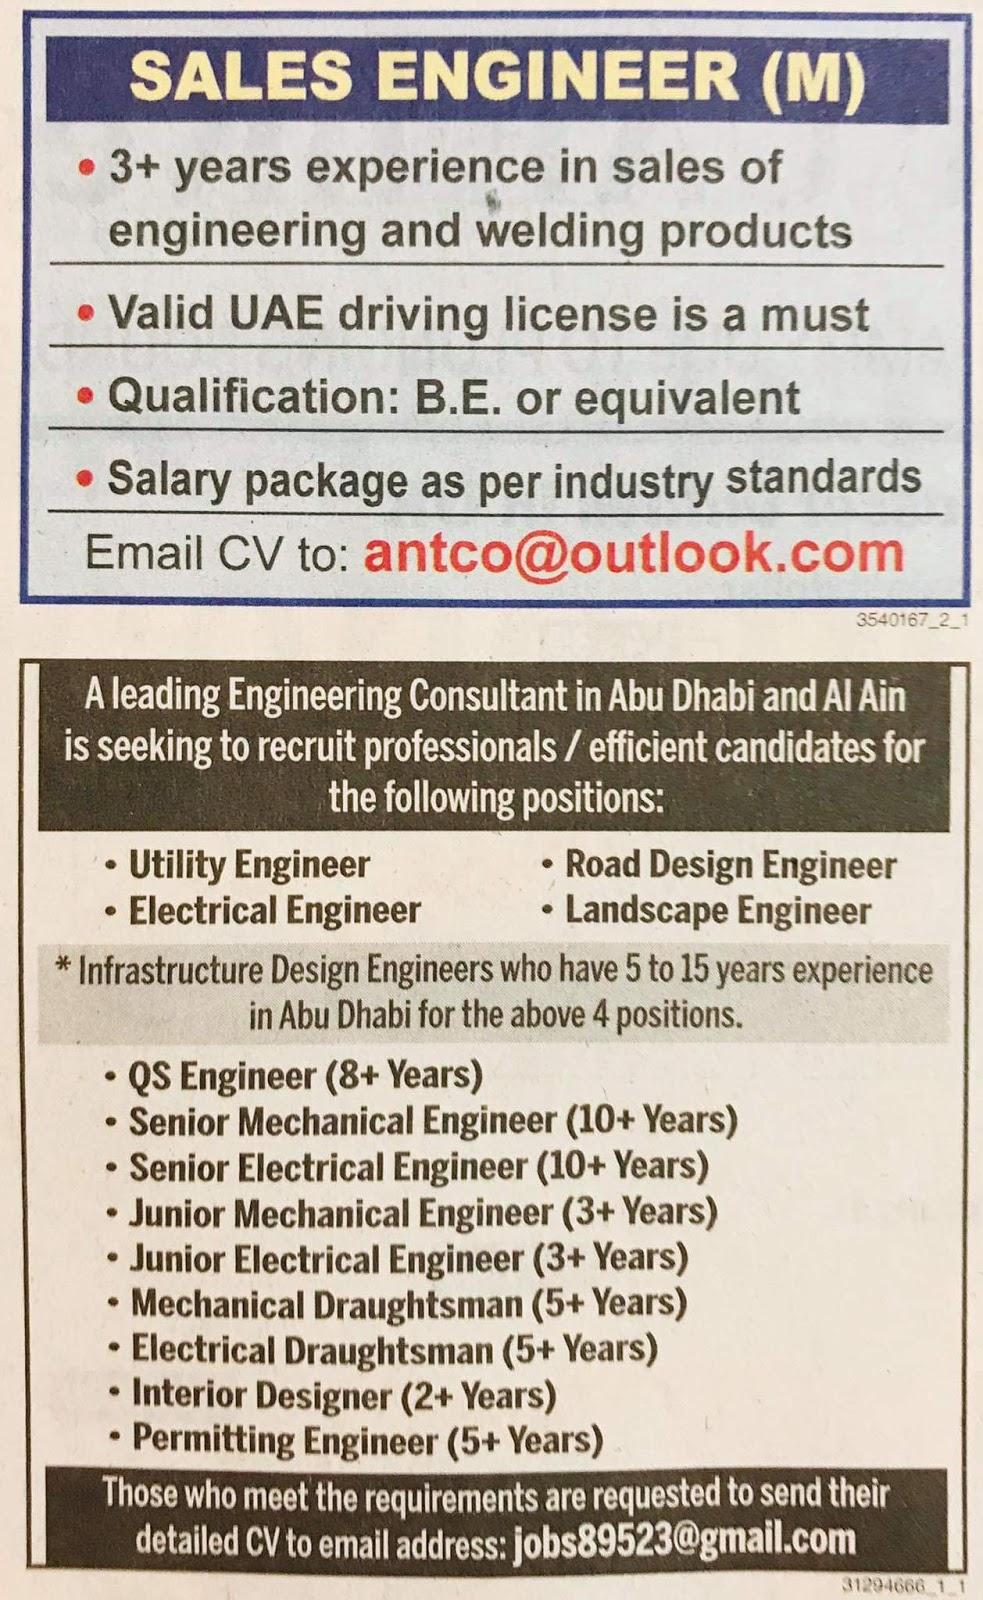 A Leading Engineering Conusltant in UAE is seeking to